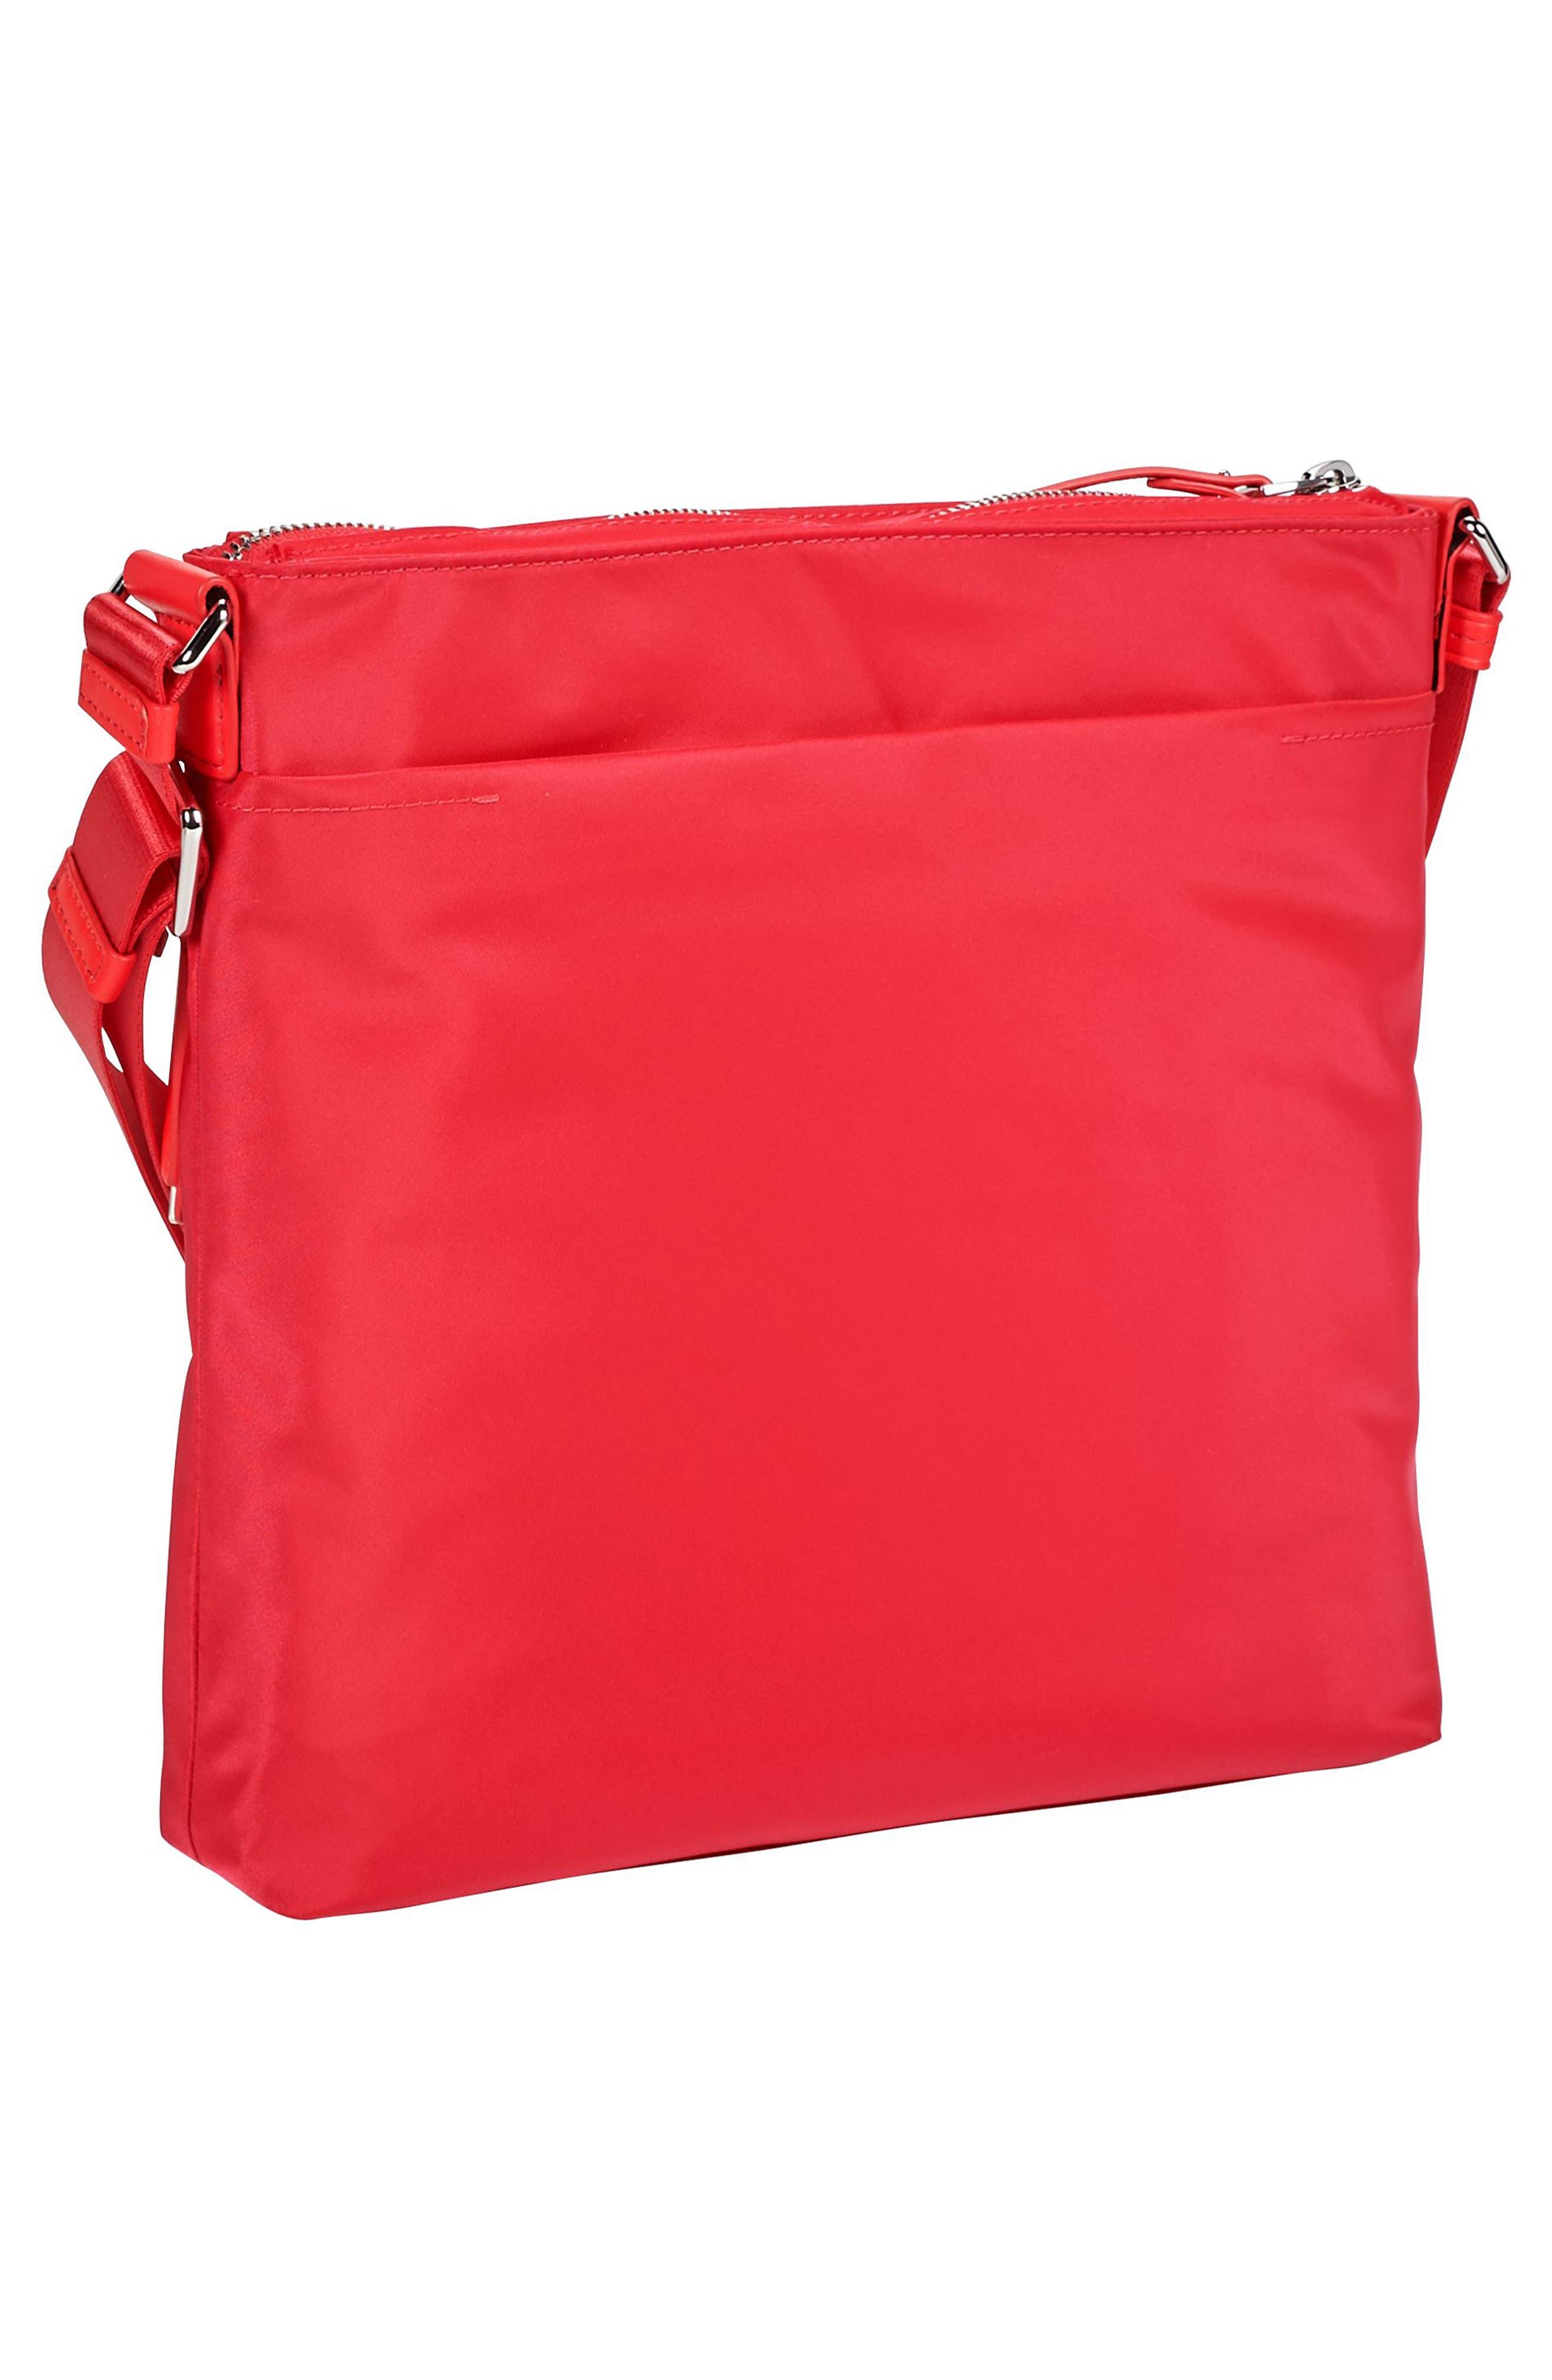 Voyageur - Capri Nylon Crossbody Bag,                             Alternate thumbnail 20, color,